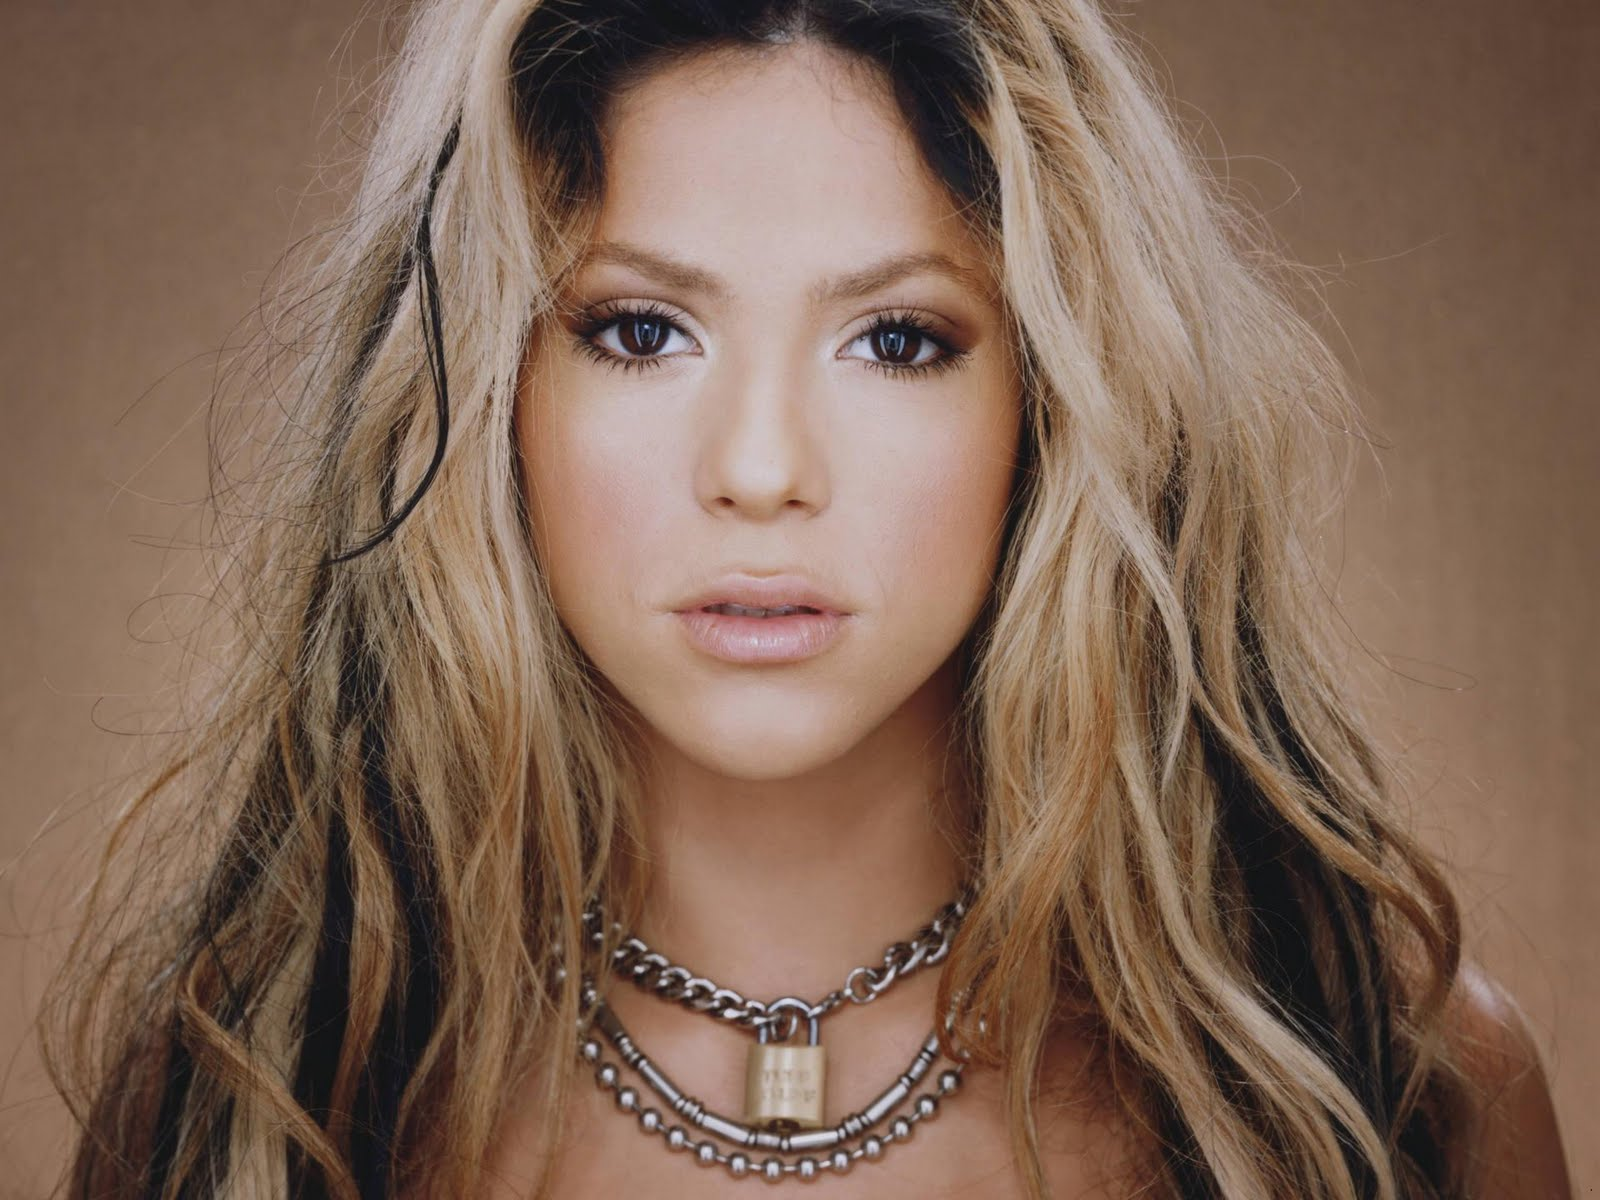 http://2.bp.blogspot.com/-owiwgy8nNHo/Ttz0l6o0rWI/AAAAAAAACMo/B9adzGpRVFA/s1600/Shakira_singer_wallpapers_06.jpg